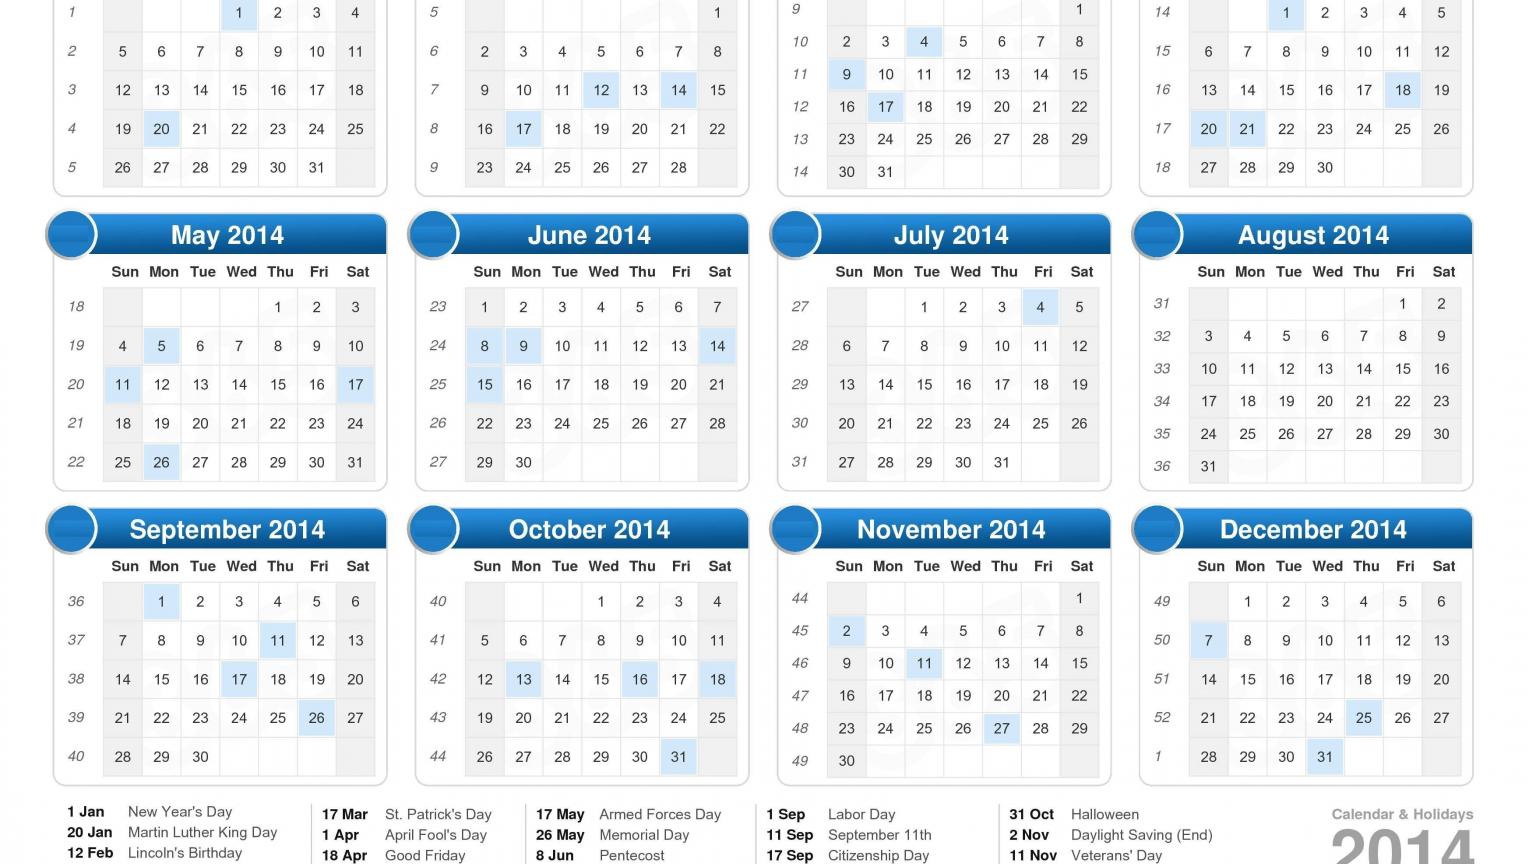 Free download Calendar 2014 Public Holidays PDF Download Festivals